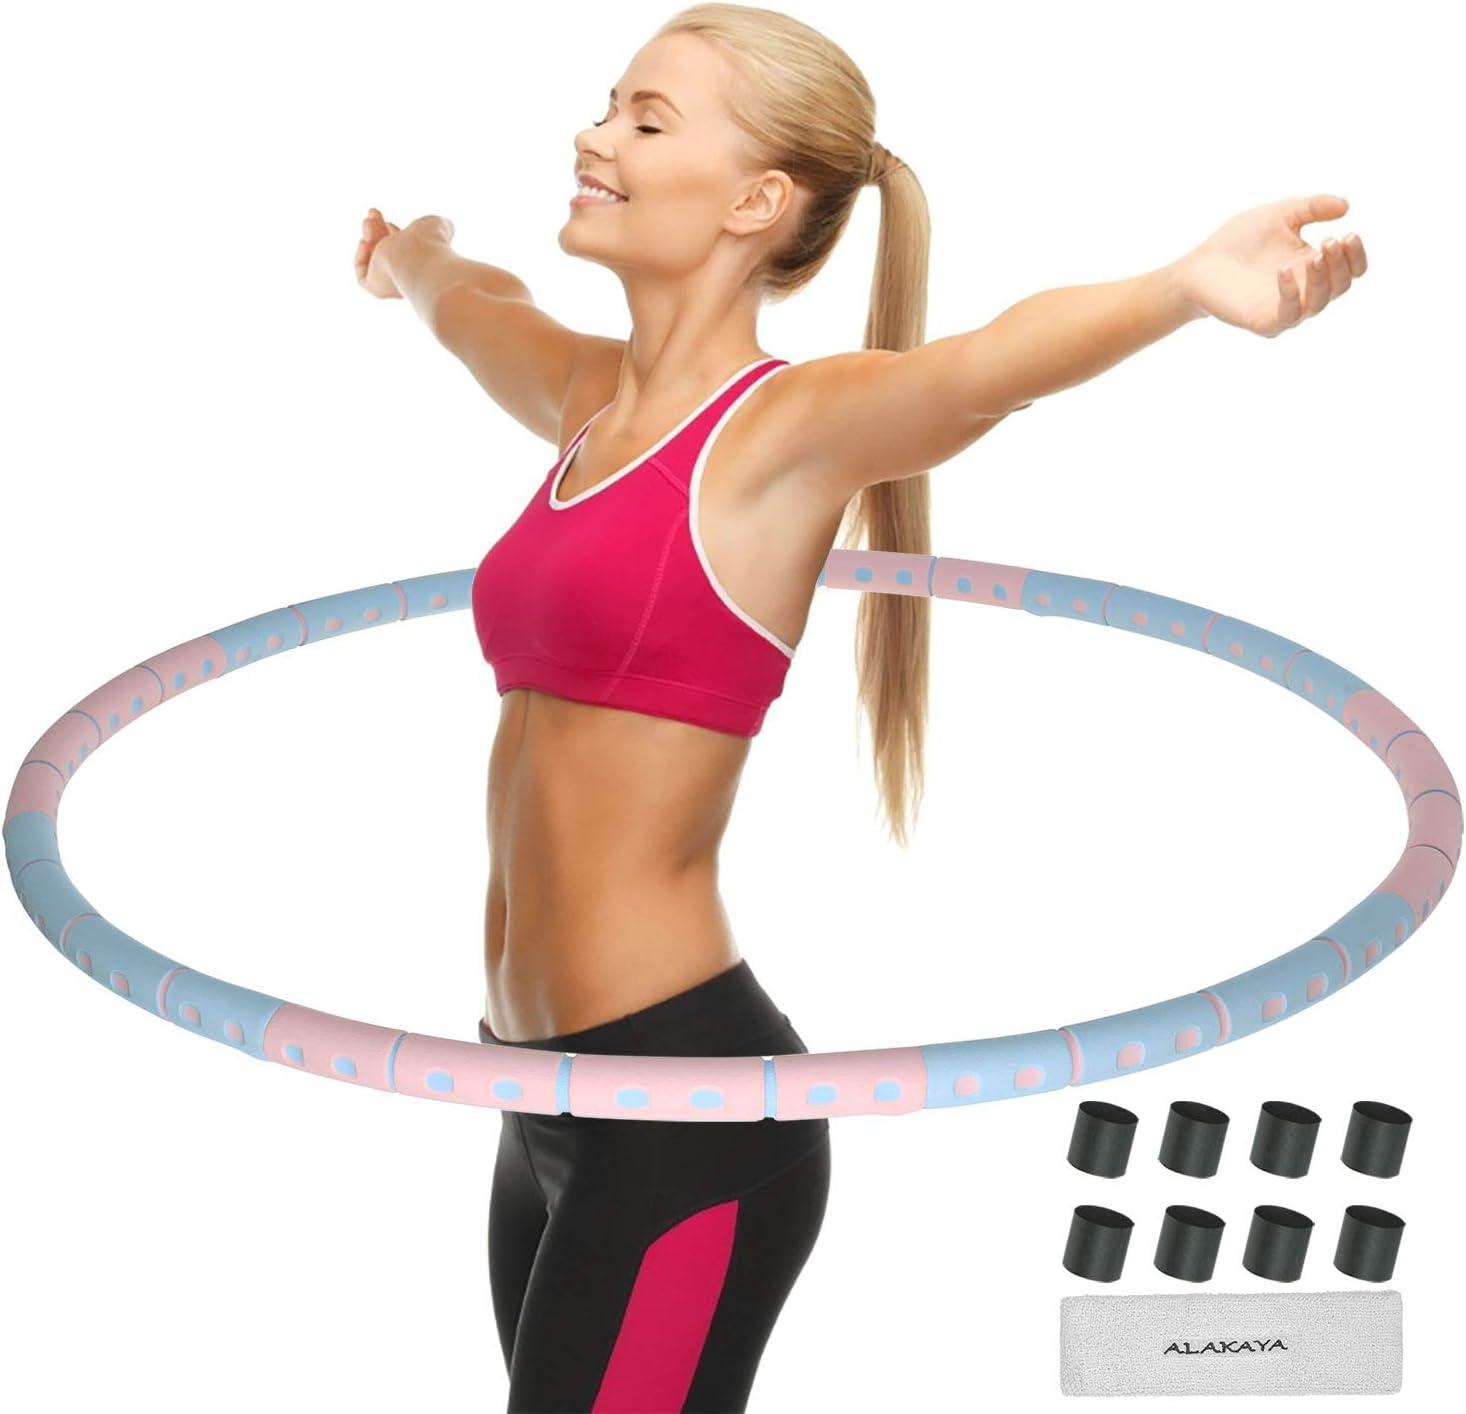 Fitness Gewichtsverlust Hula Hoops Reifen 24 artikulierte Fitness Reifen k/önnen angepasst werden Formung Taille Gewichtsverlust 2-in-1 Fitness und Massage Hula Hoops f/ür erwachsene Kinder